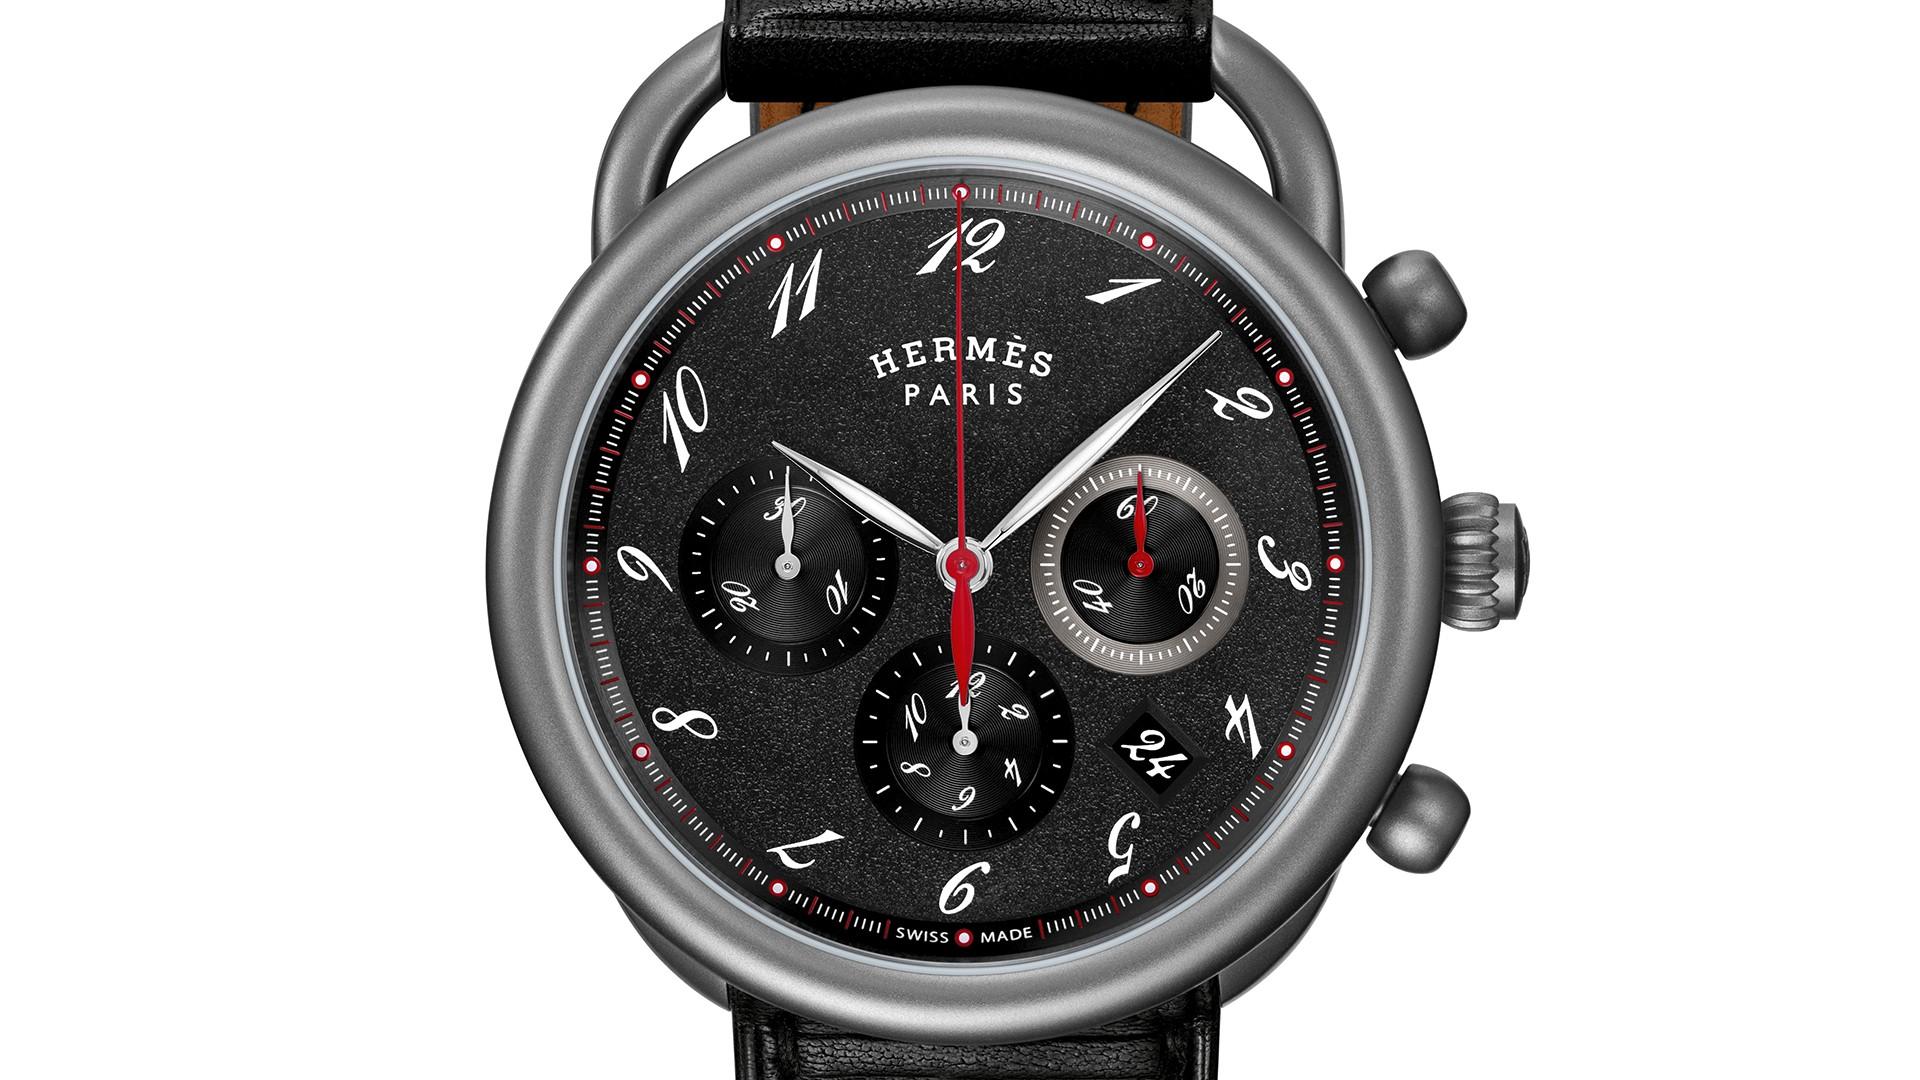 Hermes Arceau Chronographe Titane chronograph watch, SIHH 2018